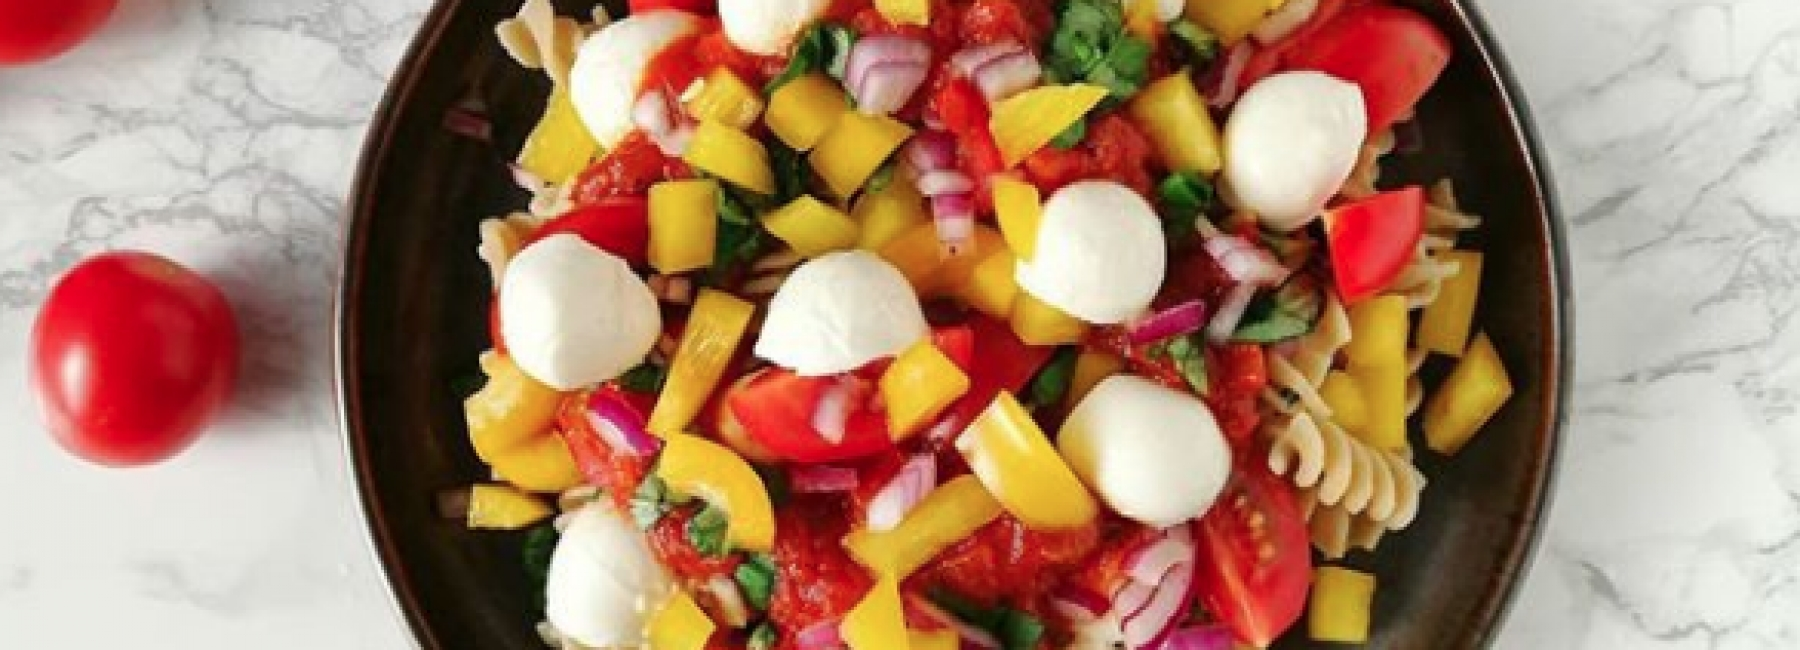 Fusilli met mozzarella, pepers, rode ui en citroen